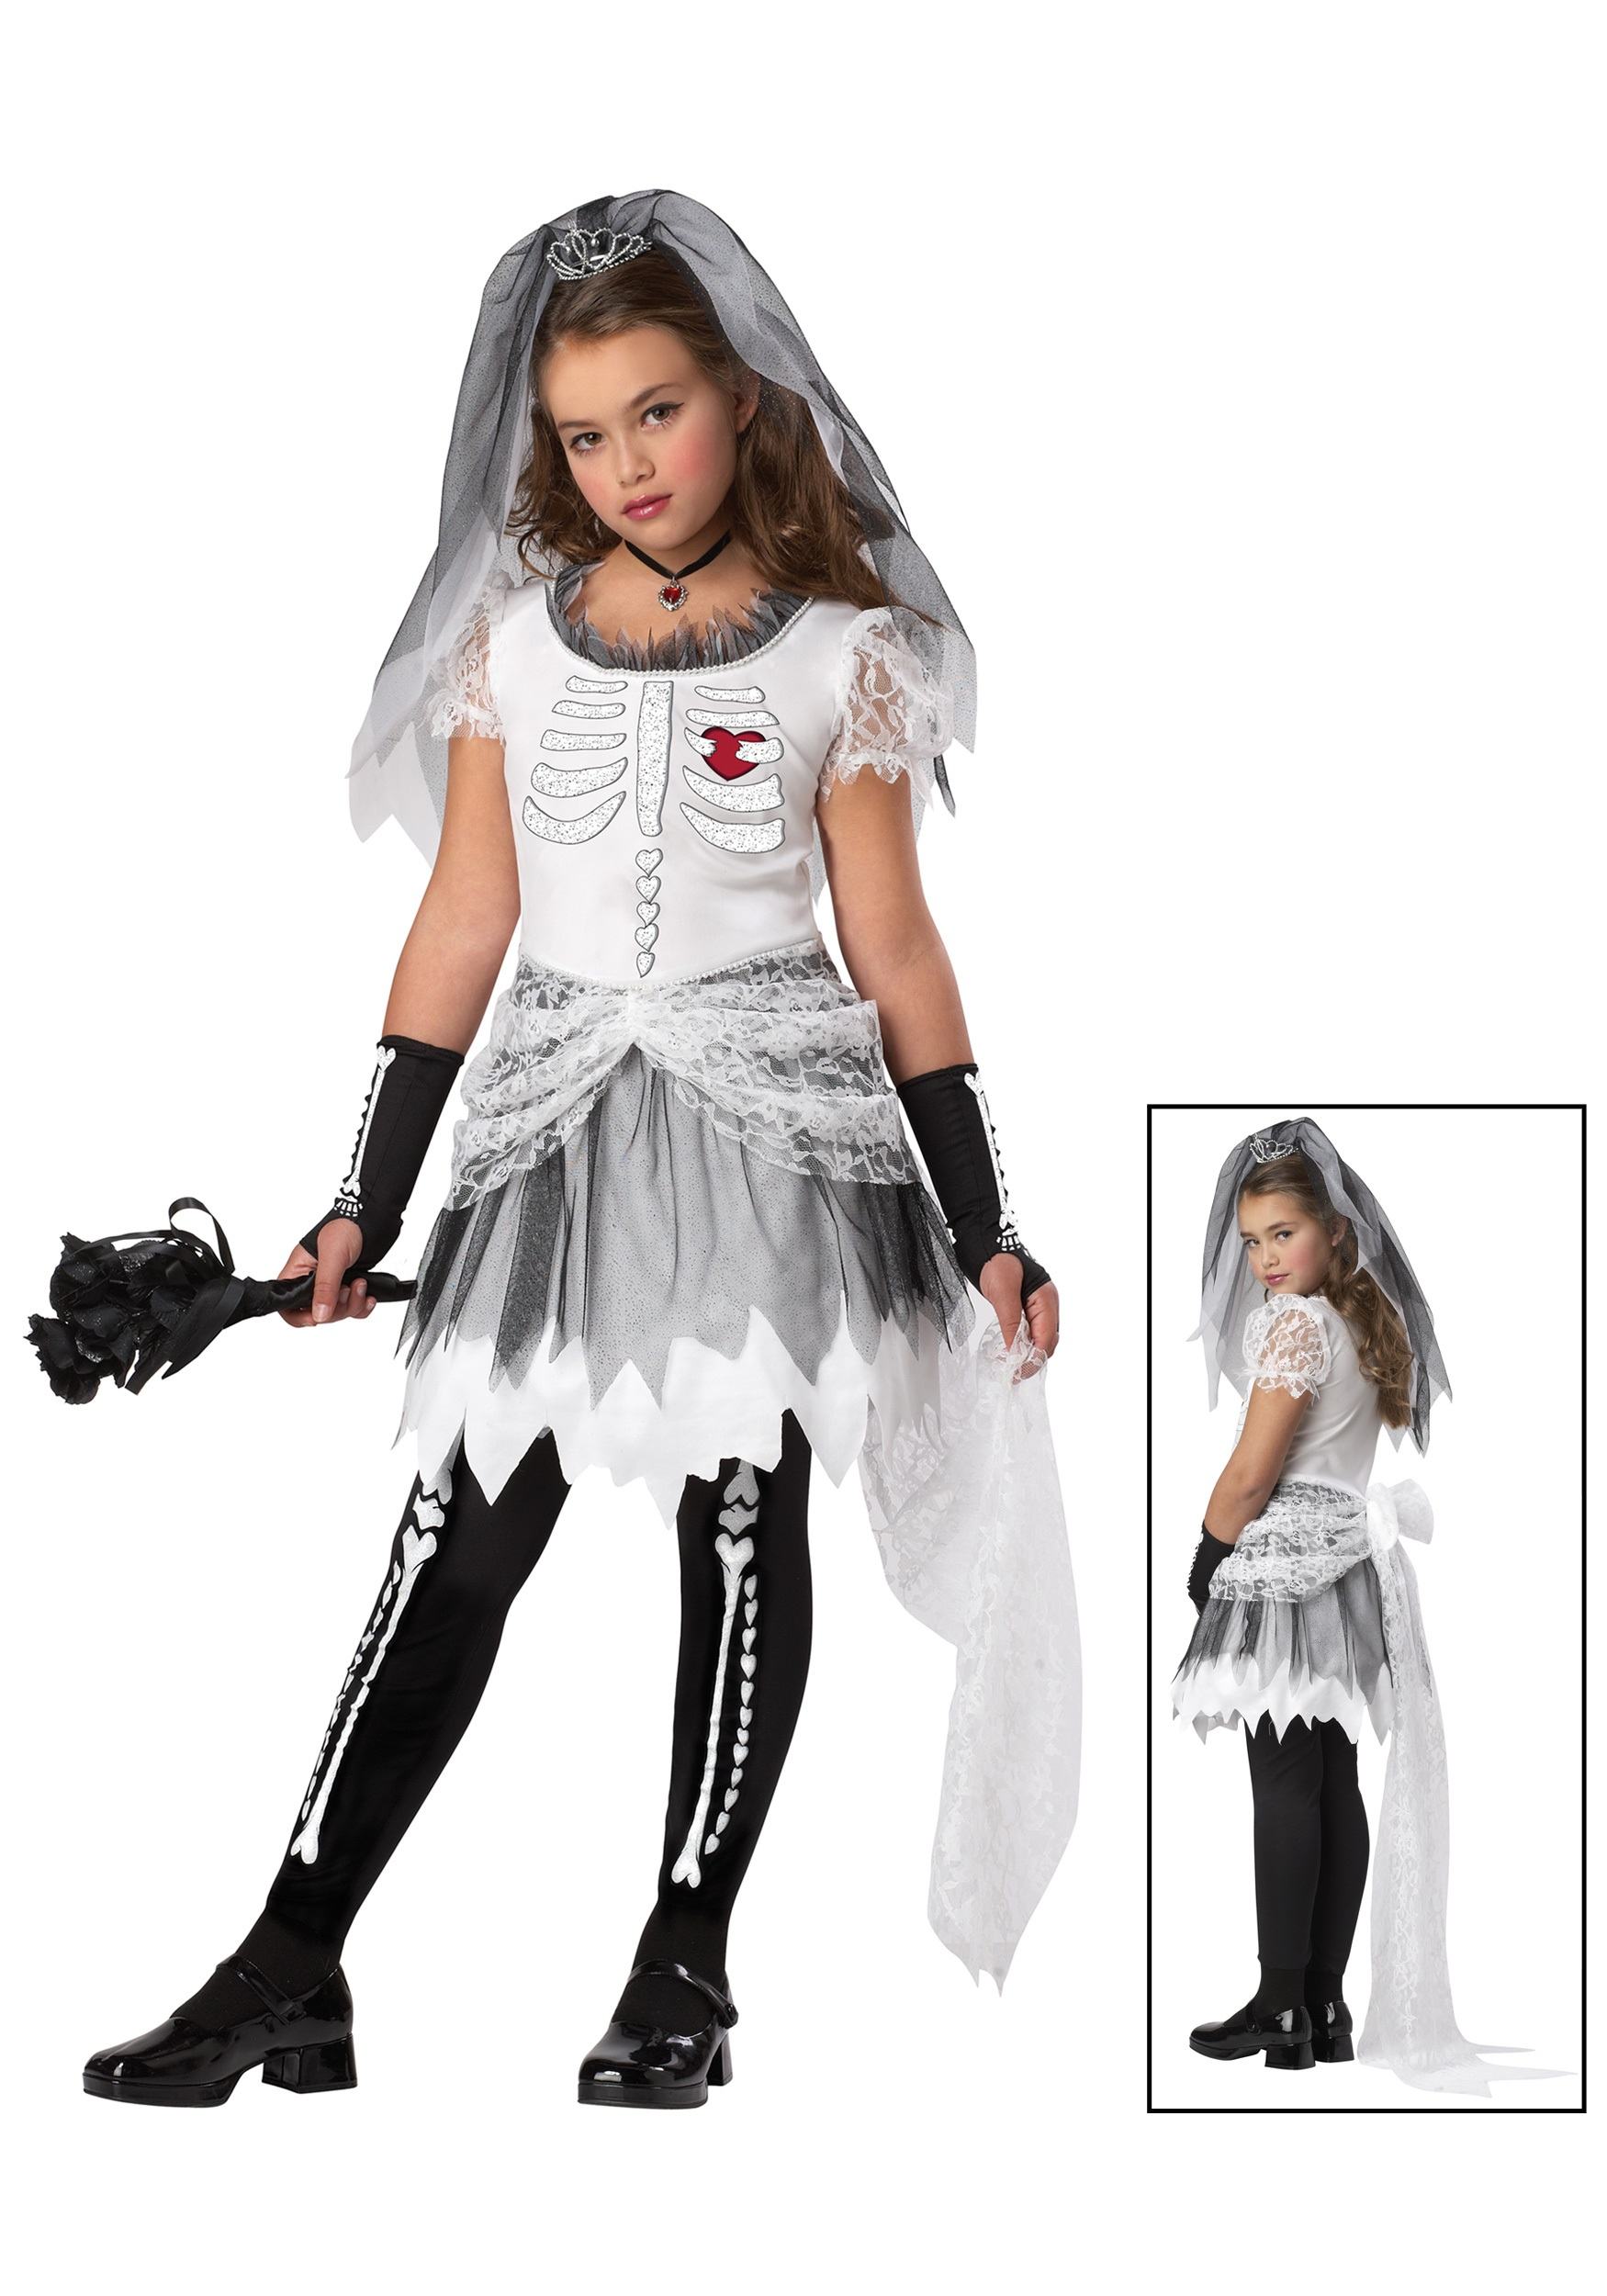 Girls Skela Bride Costume  sc 1 st  Halloween Costumes & Girls Skela Bride Costume - Halloween Costumes